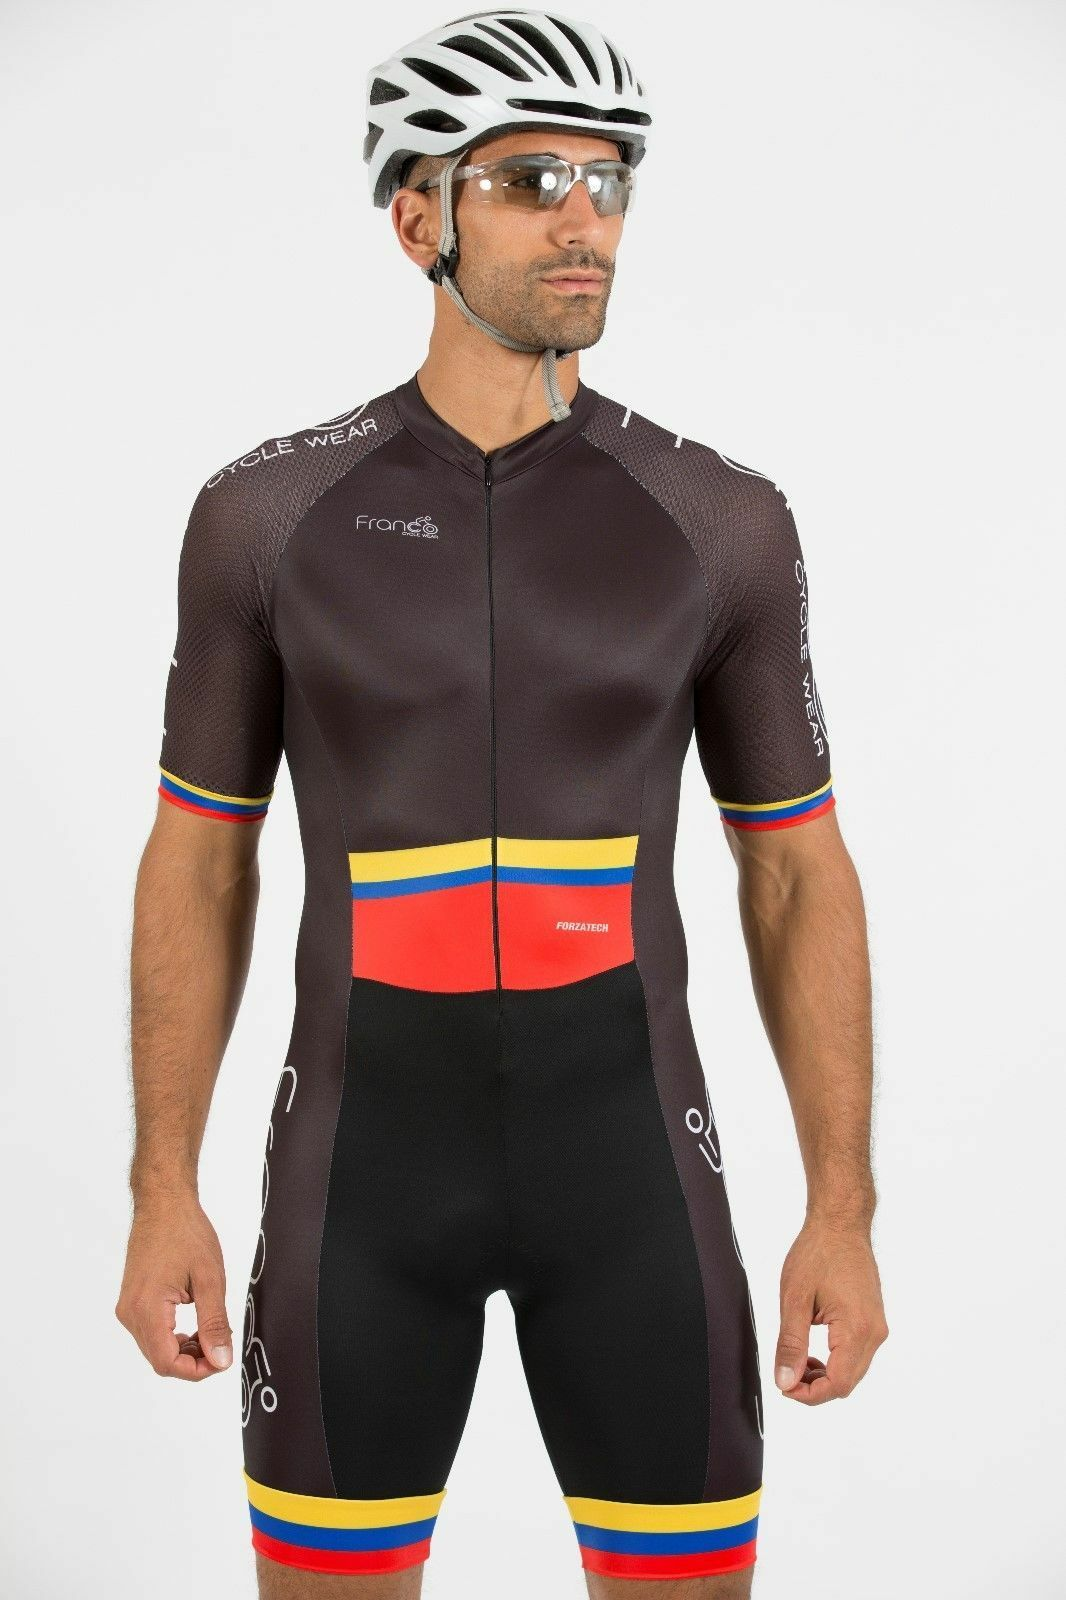 Franco Cycle Wear